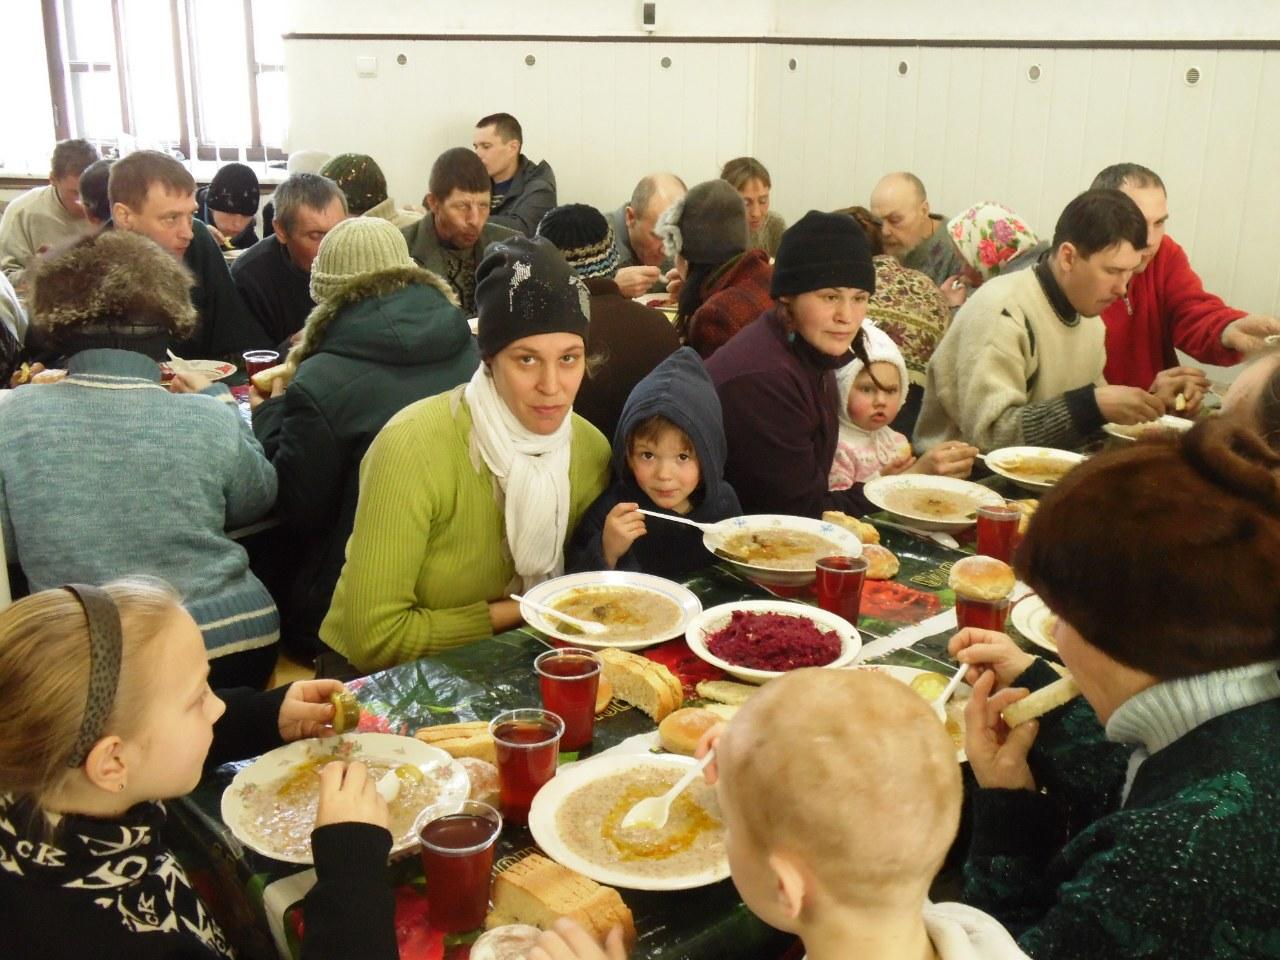 church-feeding of the people2.jpg